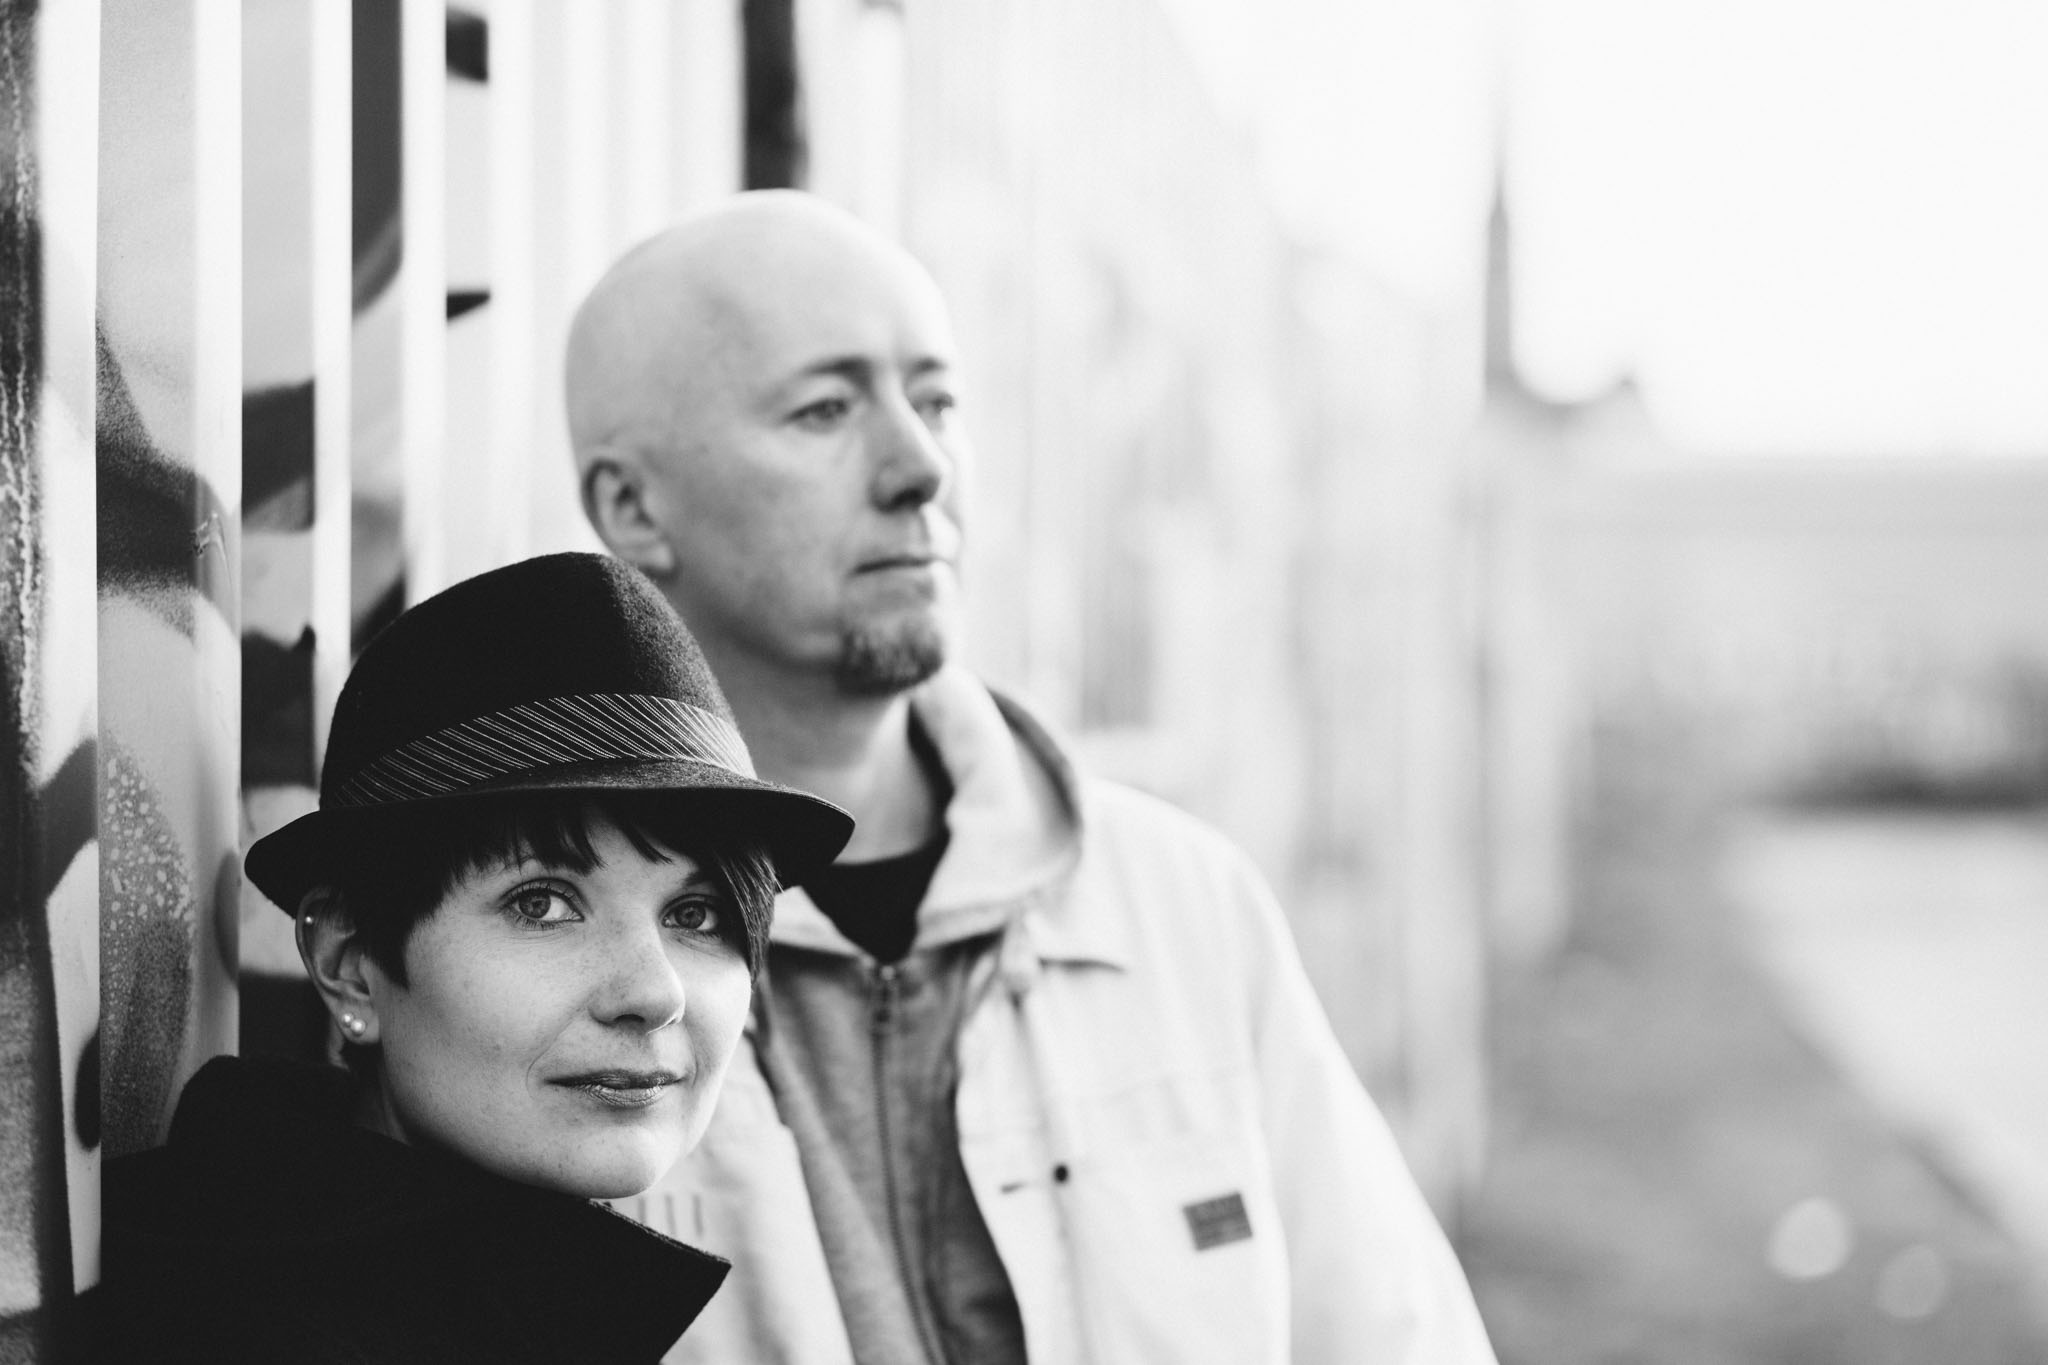 hochzeitsfotos-portraits-schwarzweiss-fotograf-berlin